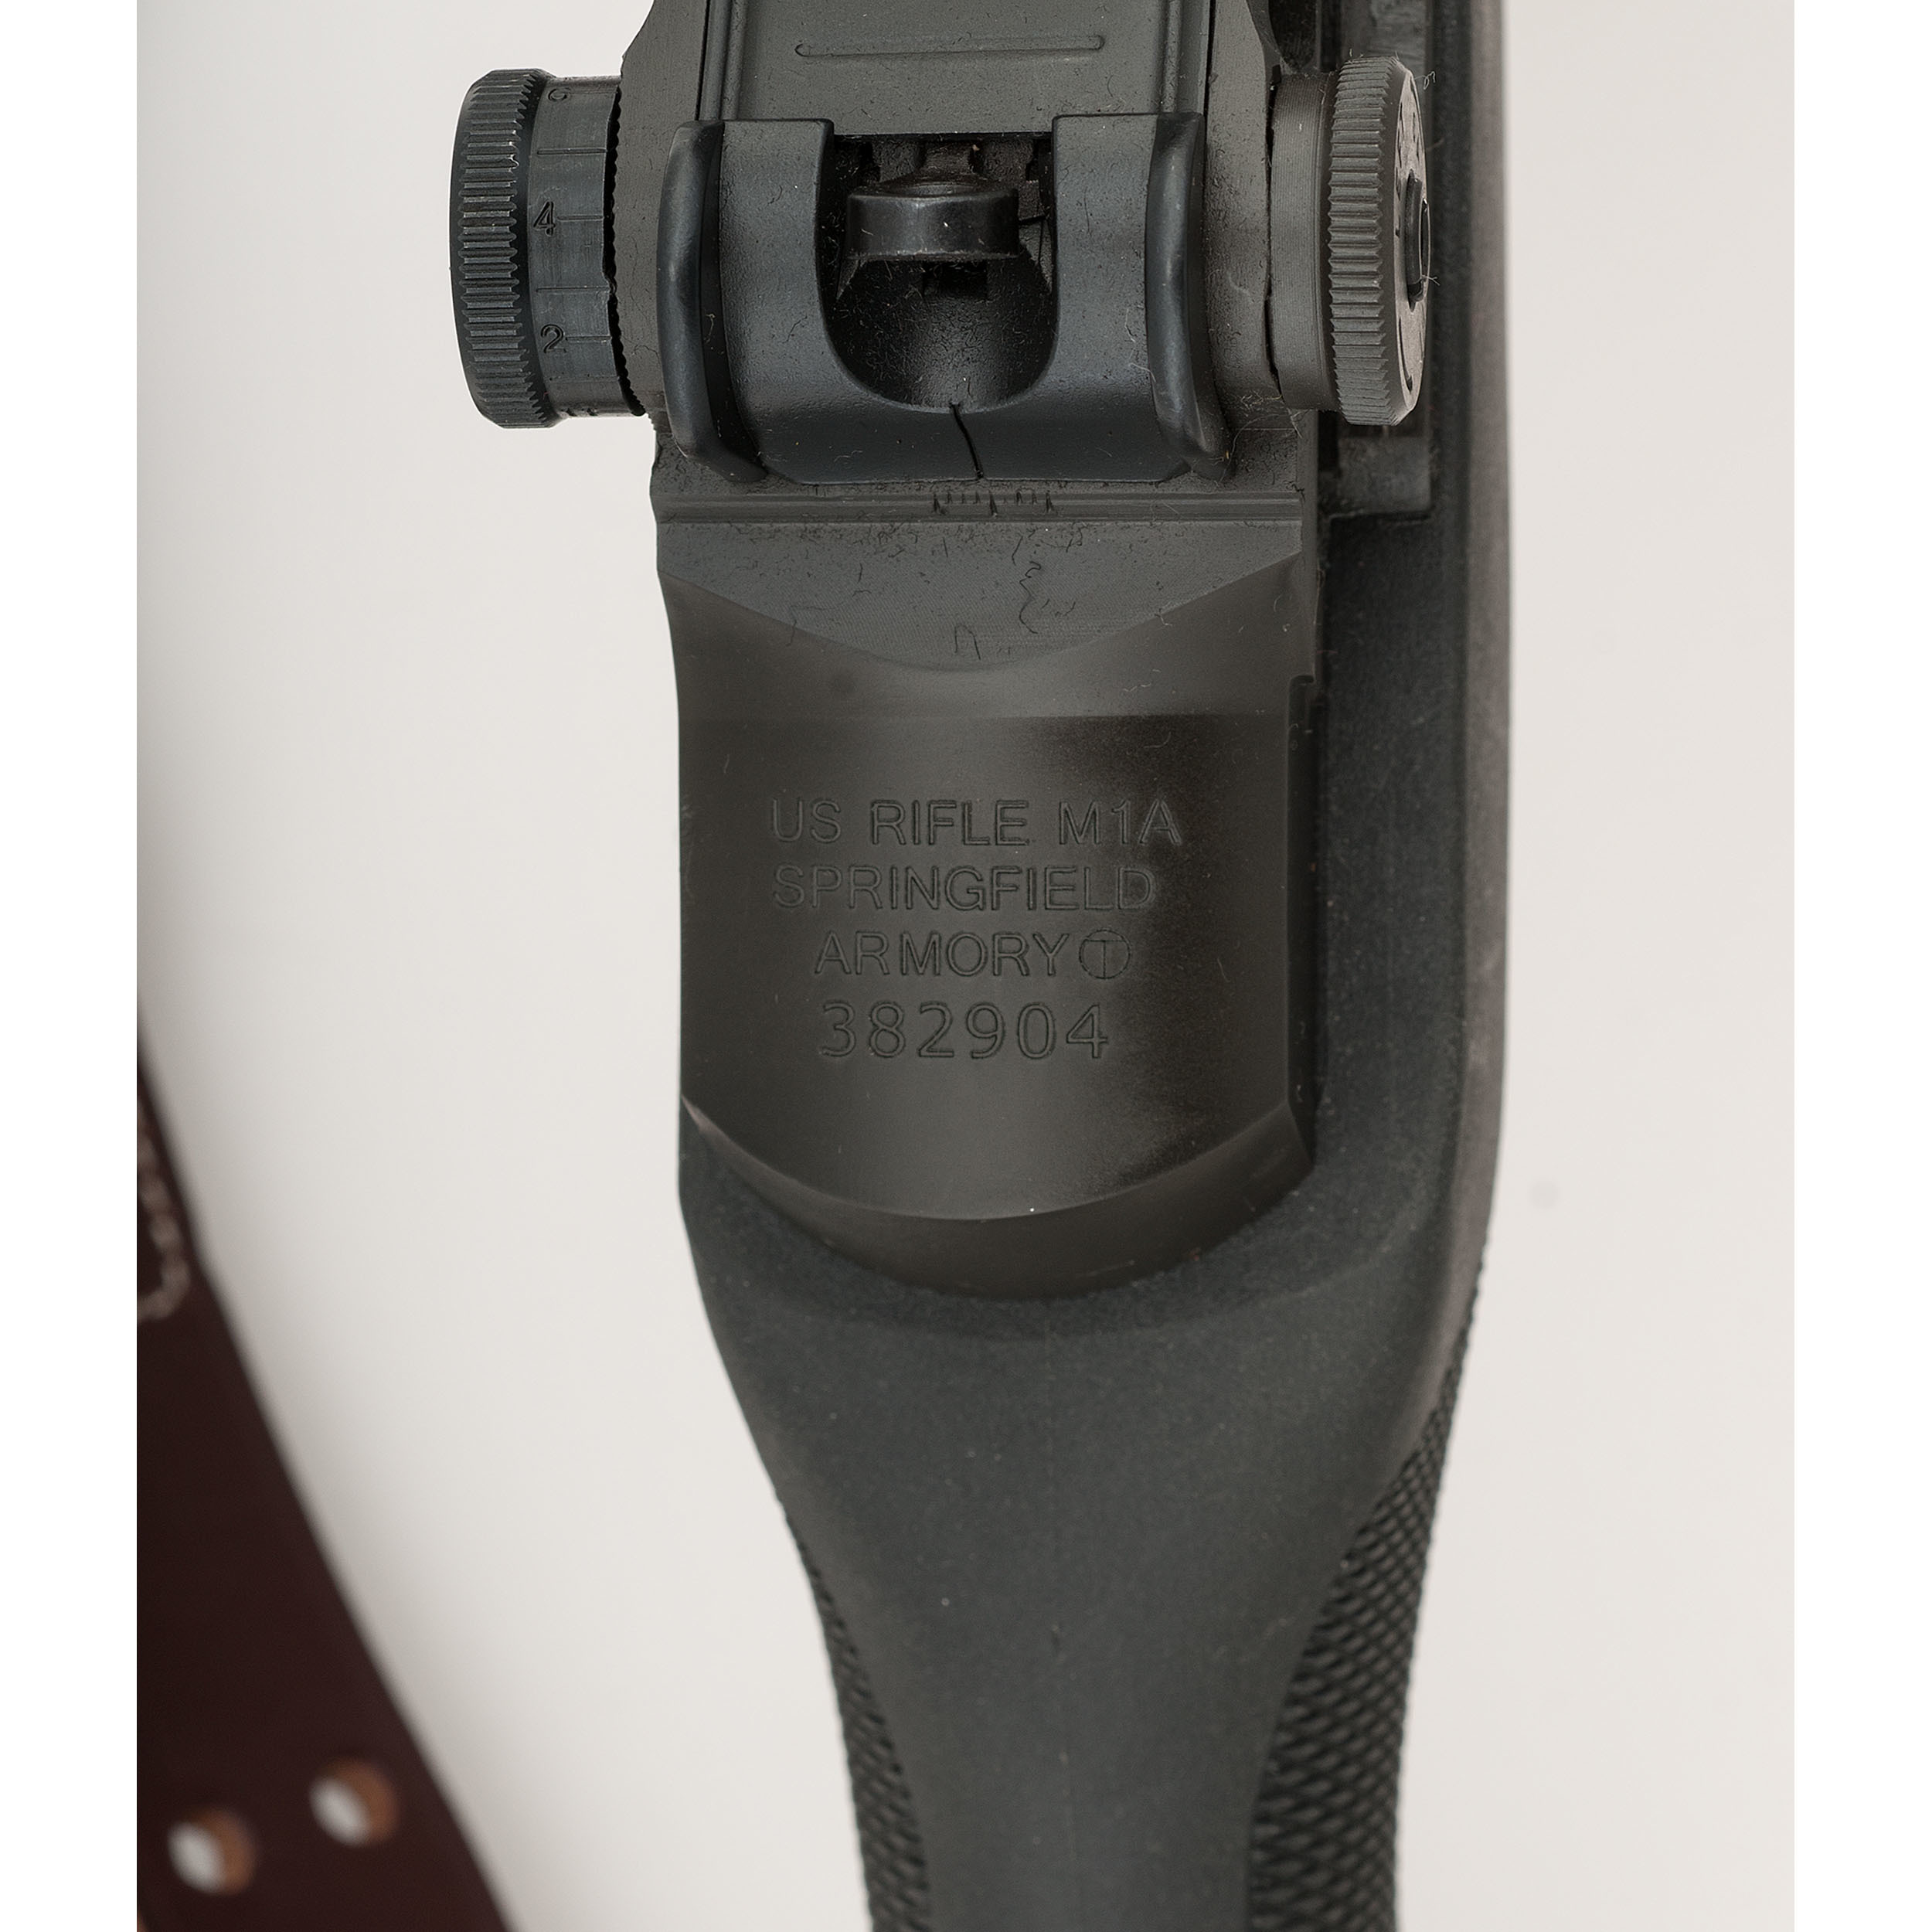 * Springfield Armory Socom 16 M1A Rifle